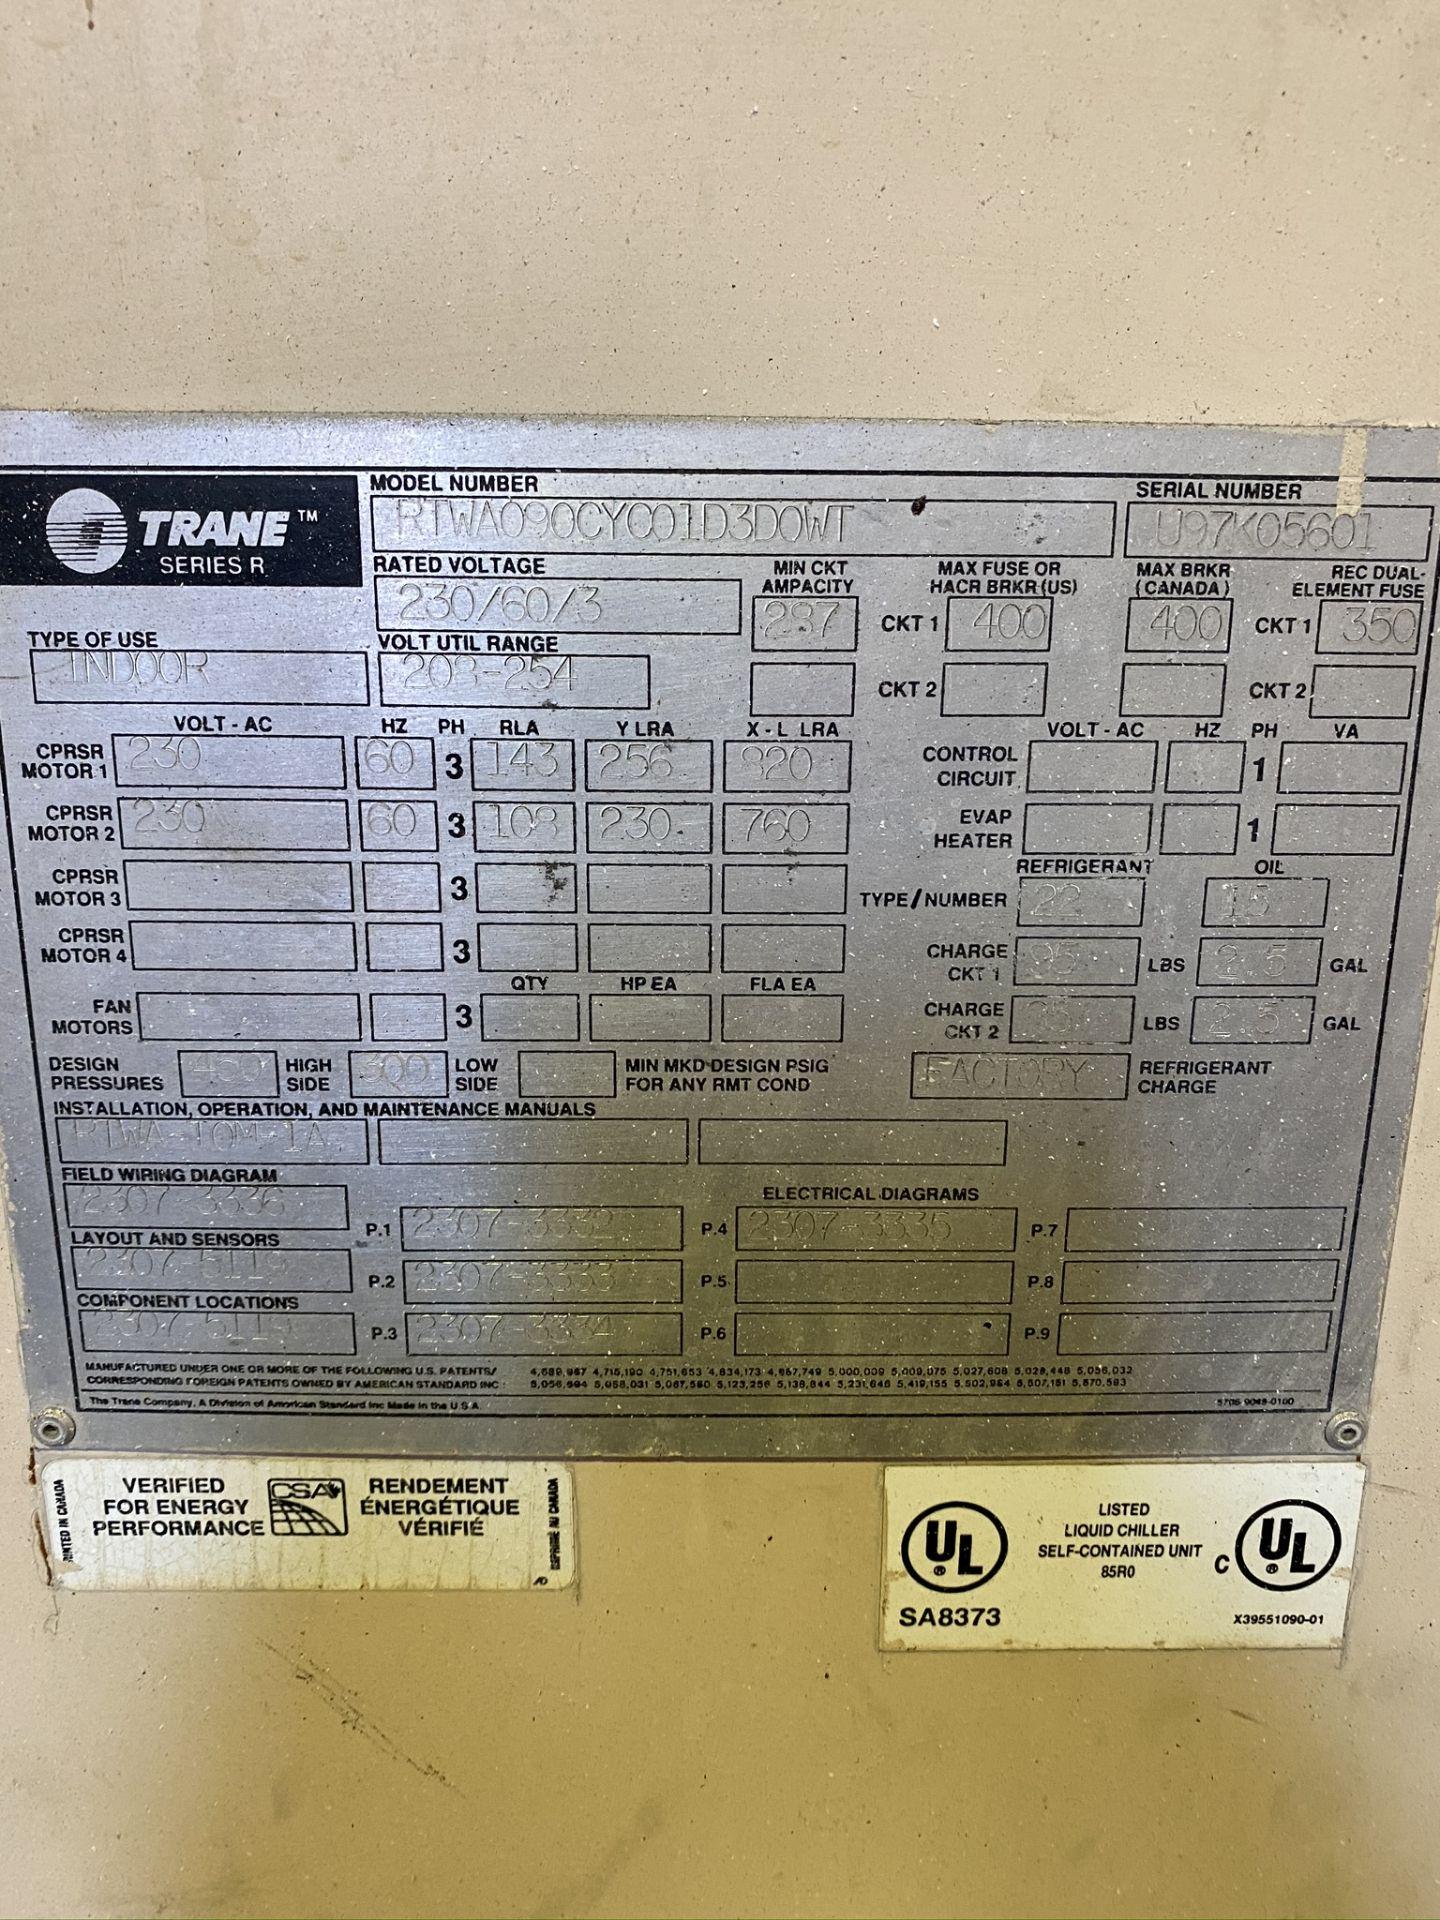 Lot 19 - TRANE SERIES R CHILLER, MODEL RTWA090CYC01D3D0WT